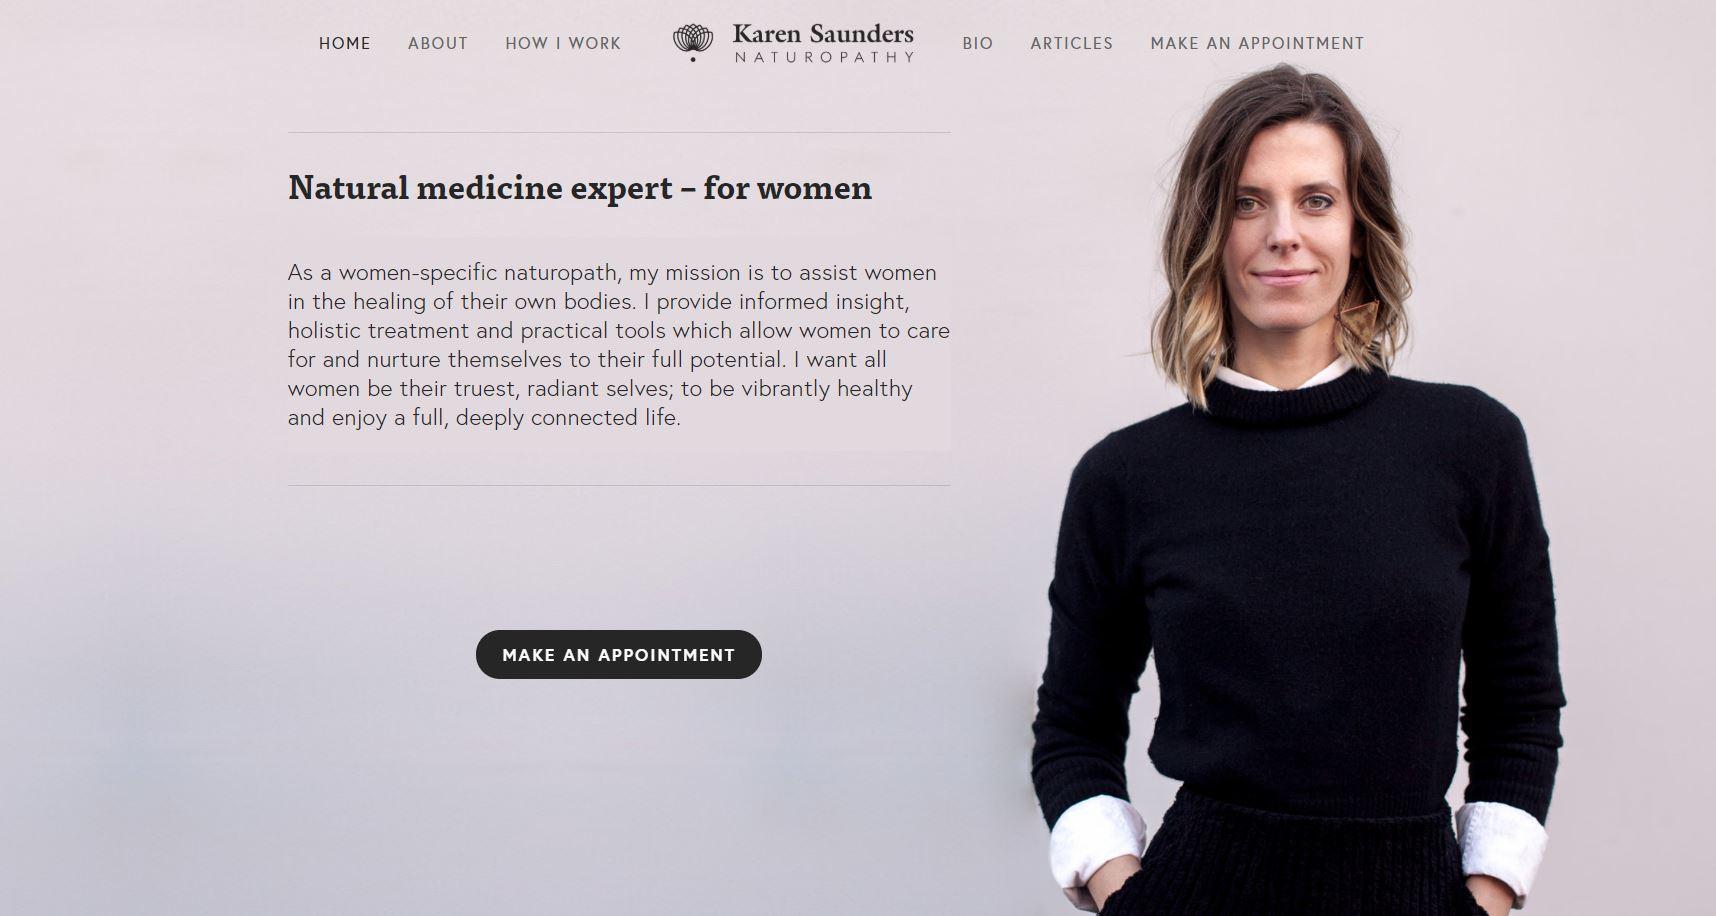 Karen Saunders Naturopathy.